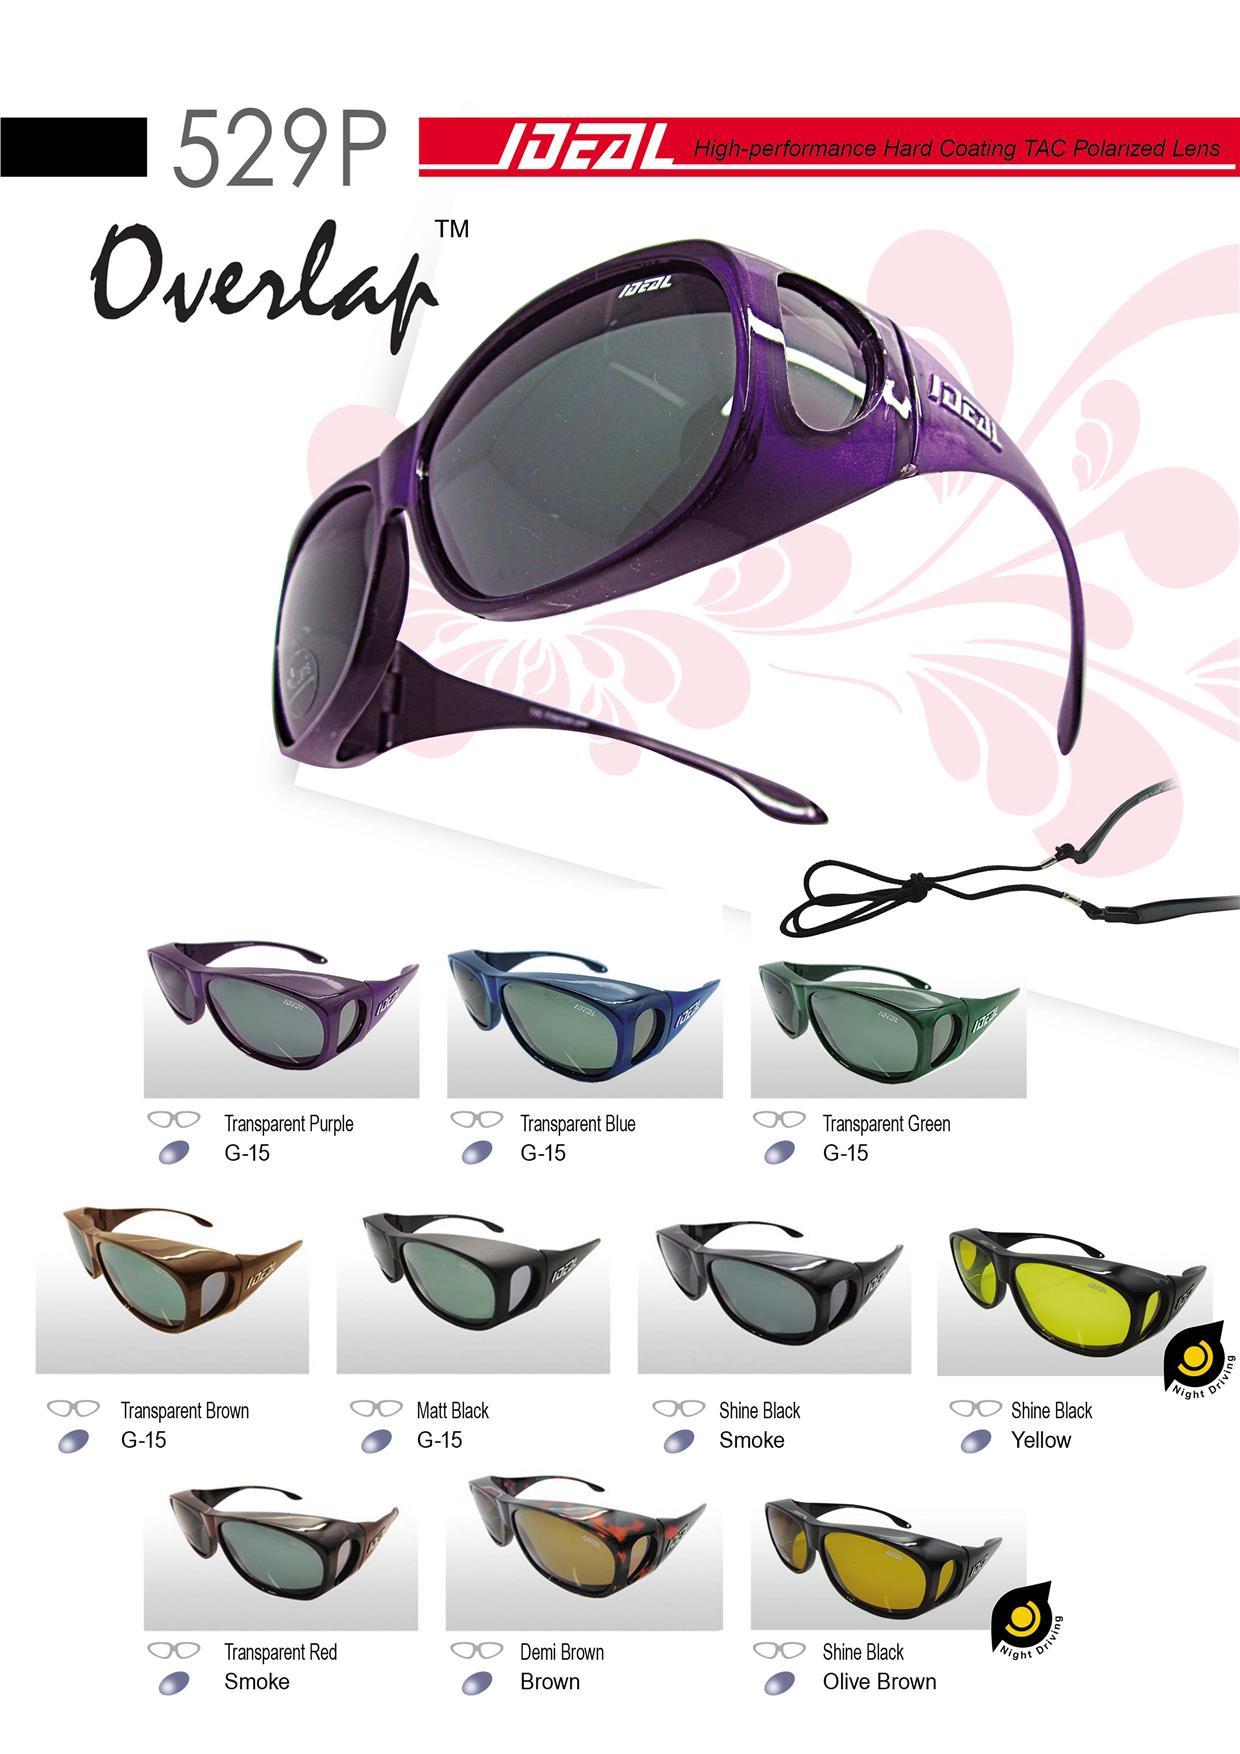 66d3e8f024 IDEAL - FitOver Overlap Polarized Sunglasses Unisex Style - Model 529P